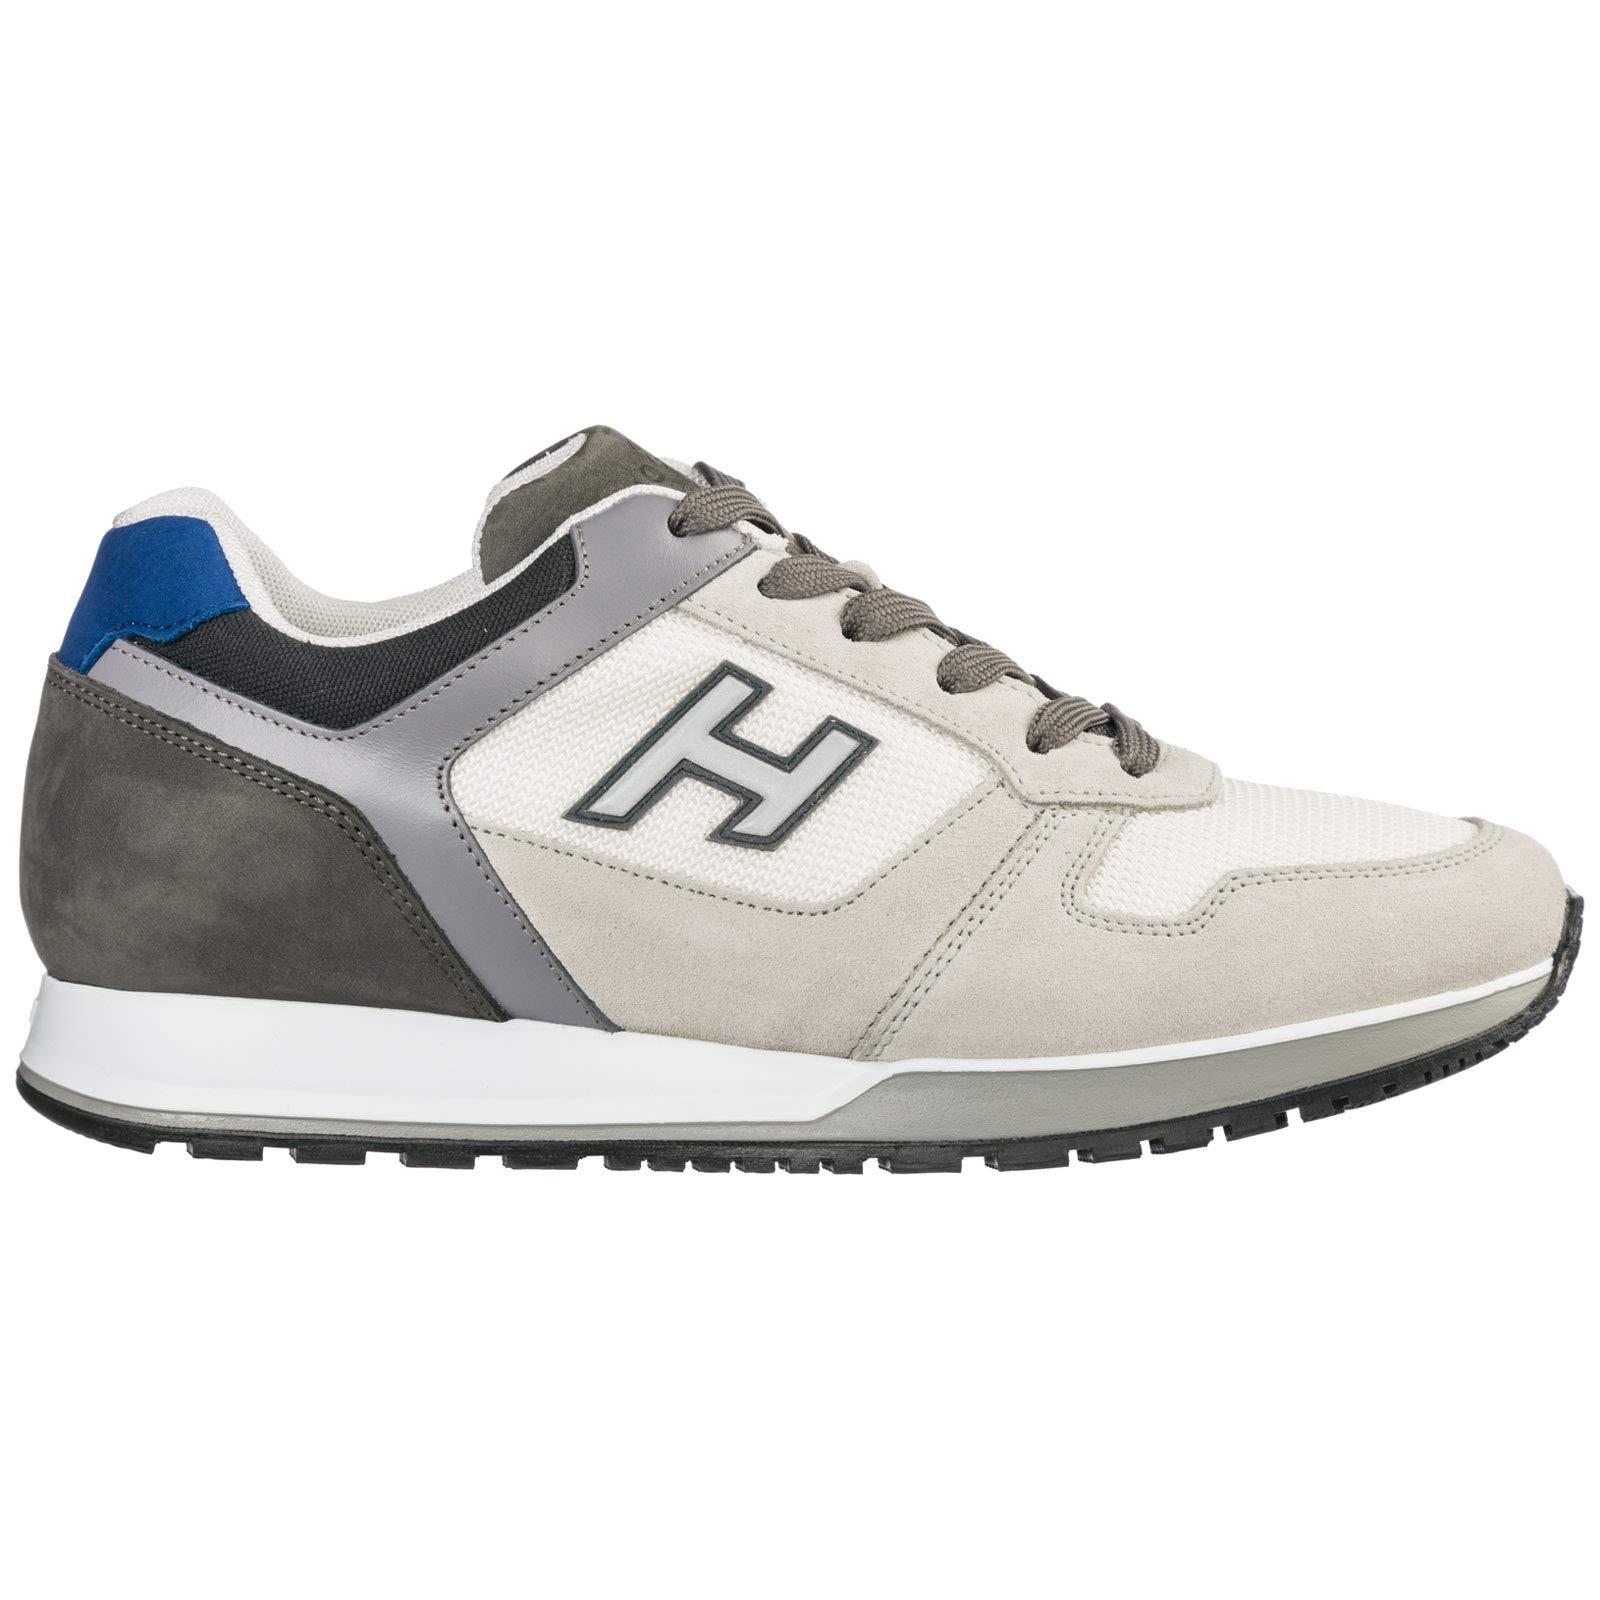 Hogan Men H321 Sneakers Bianco,Avorio,Grigio- Buy Online in Faroe ...